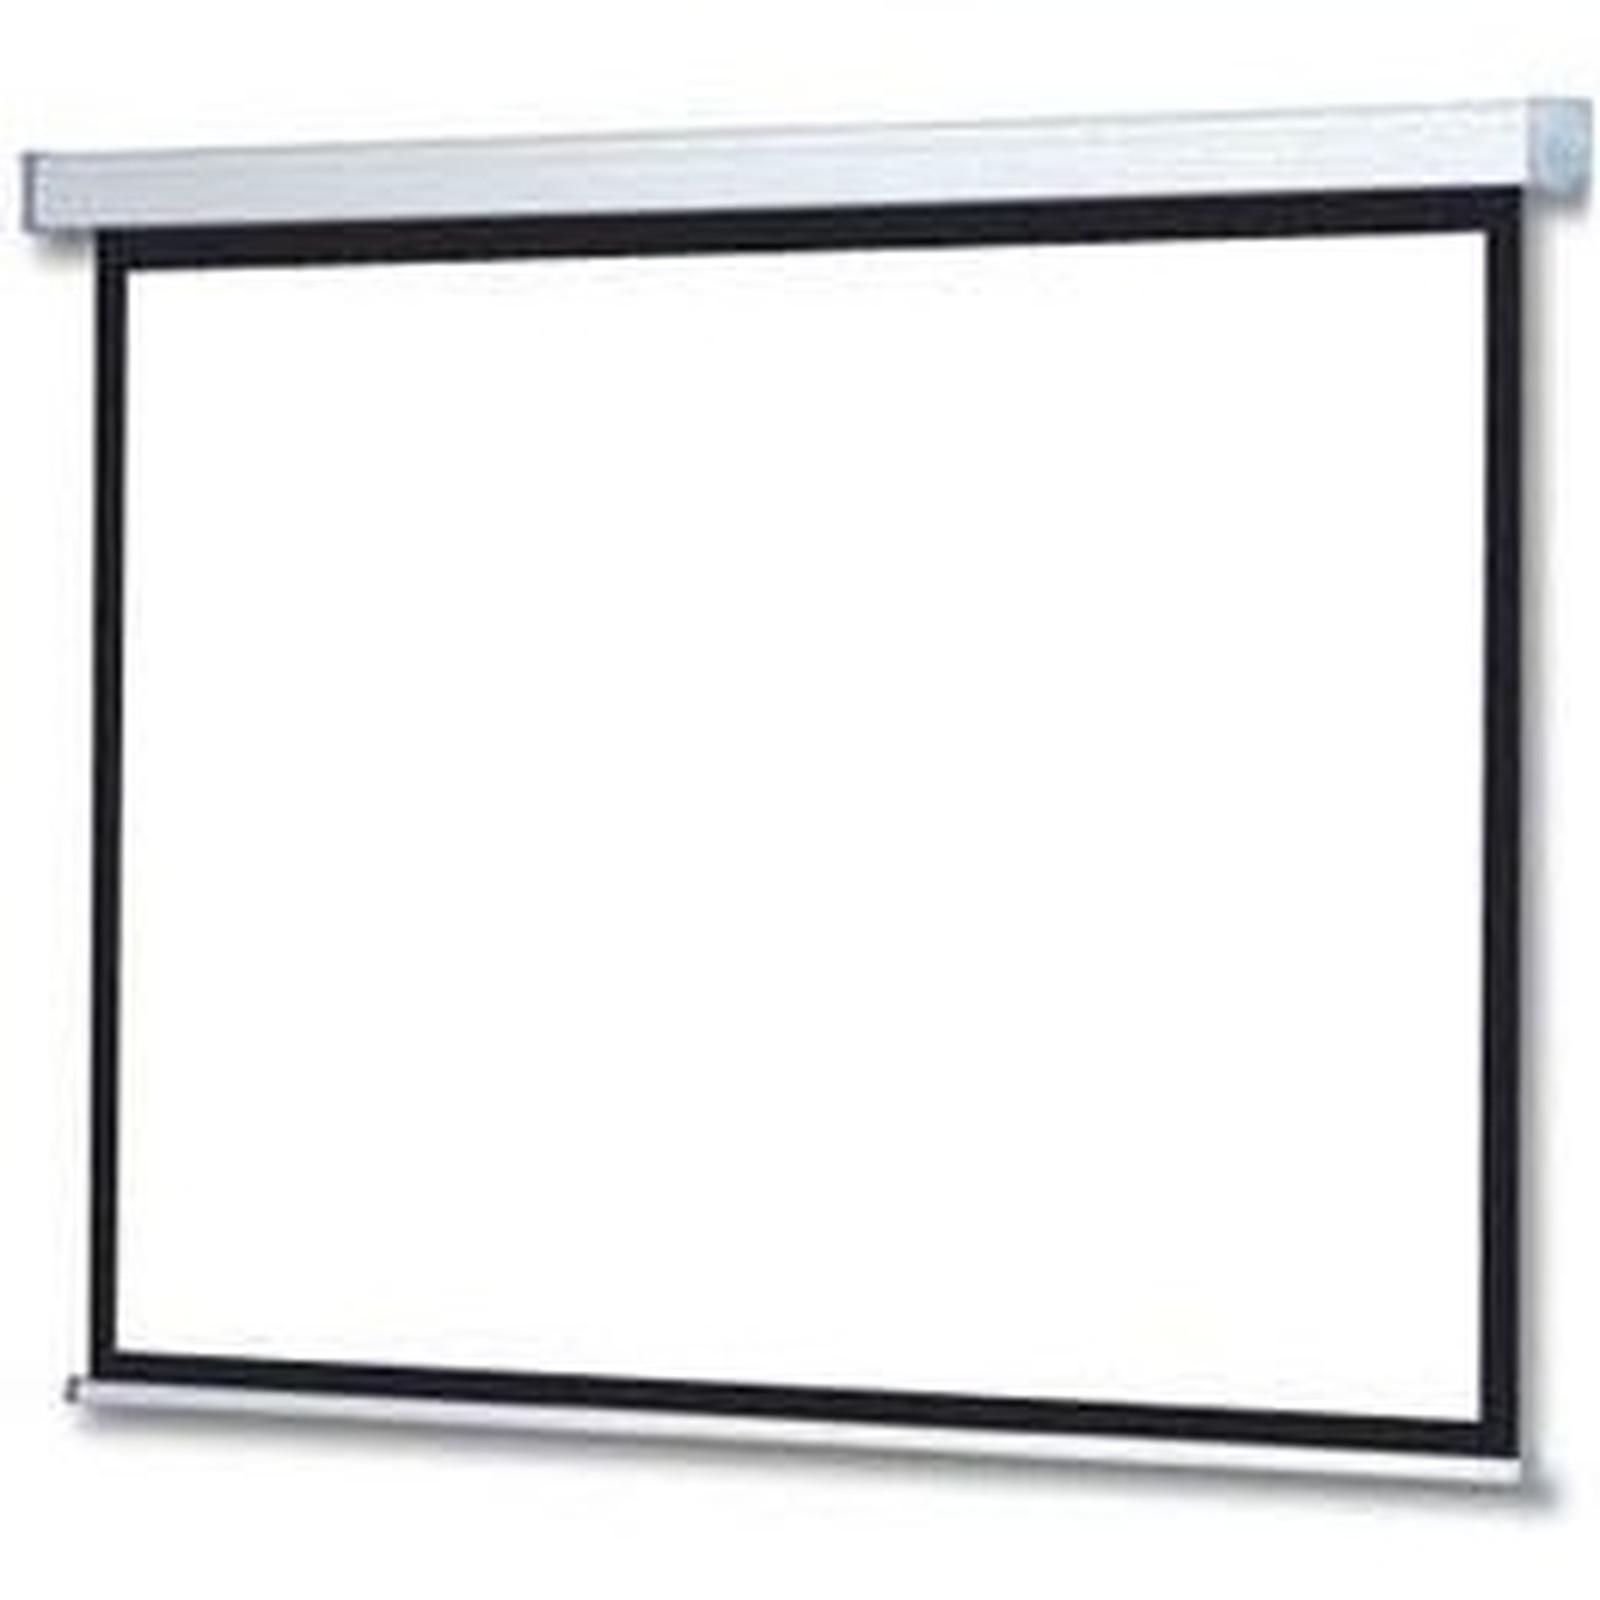 LDLC Ecran motorisé - Format 16:9 - 180 x 102 cm